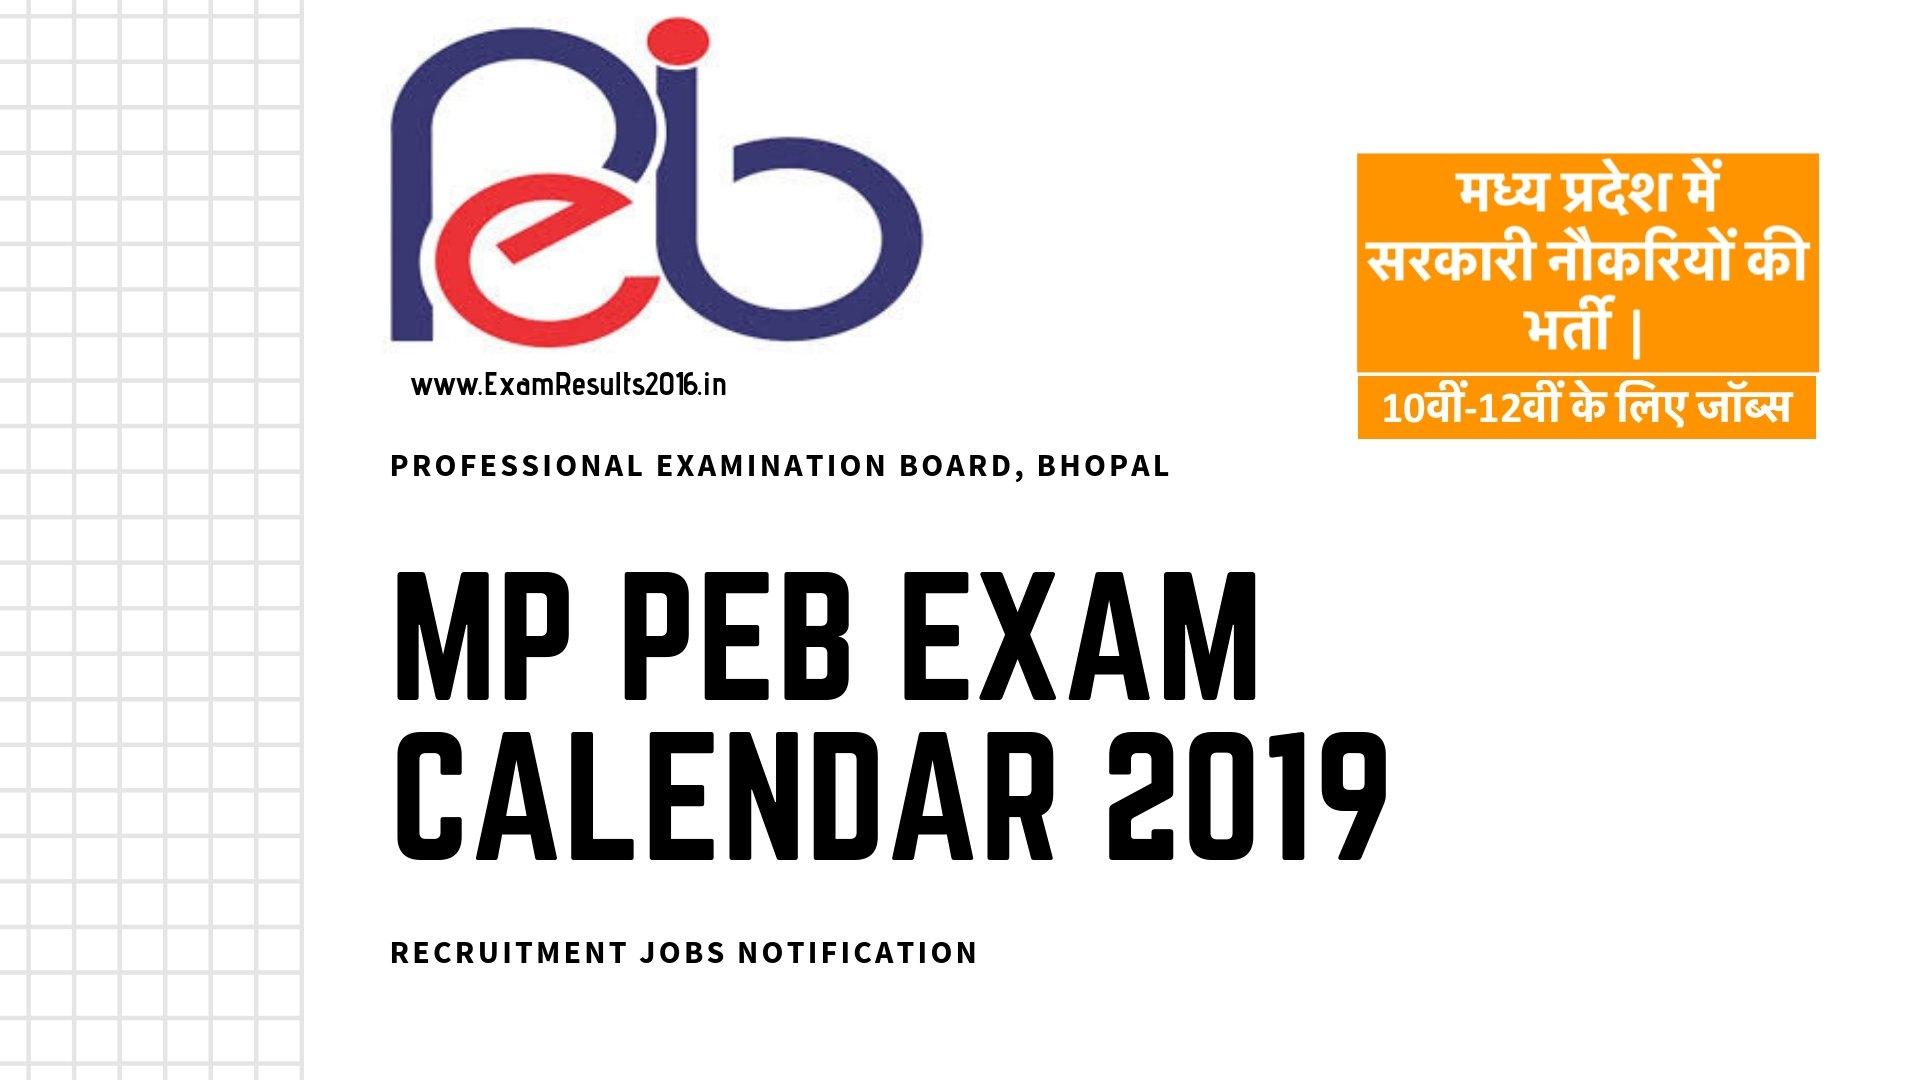 Mp Peb Exam Calendar 2019, Upcoming Recruitment Jobs Notification Calendar 2019 Neu